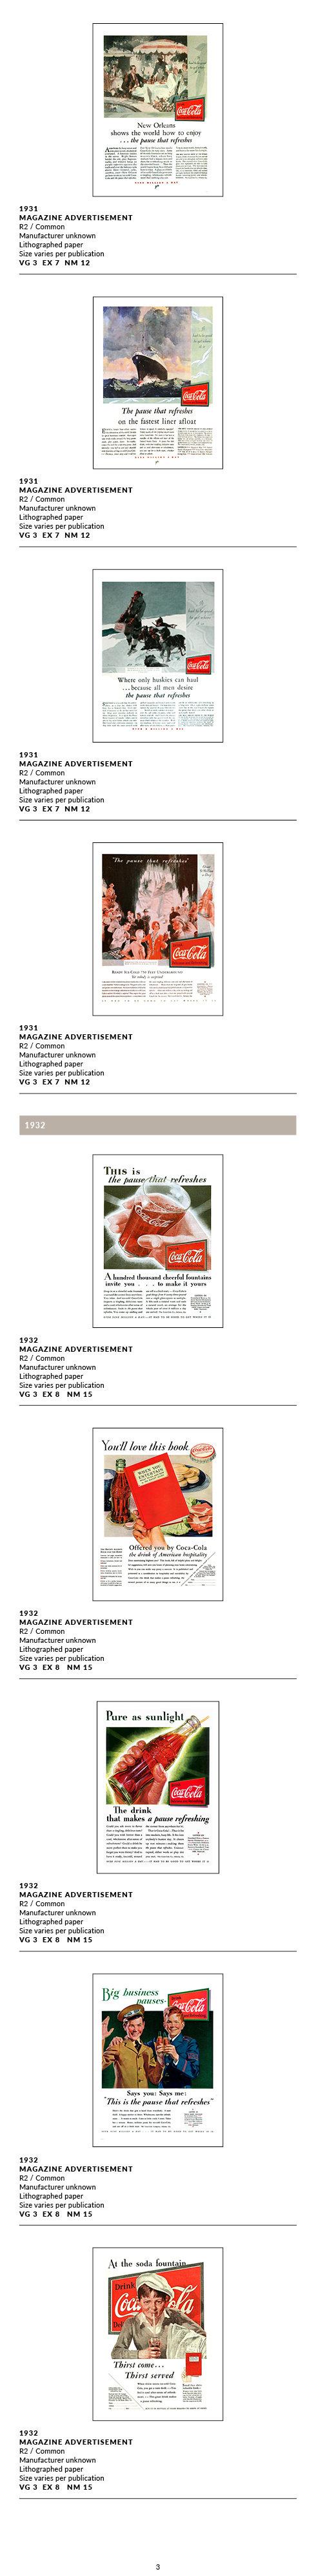 1930-34 Ads3.jpg